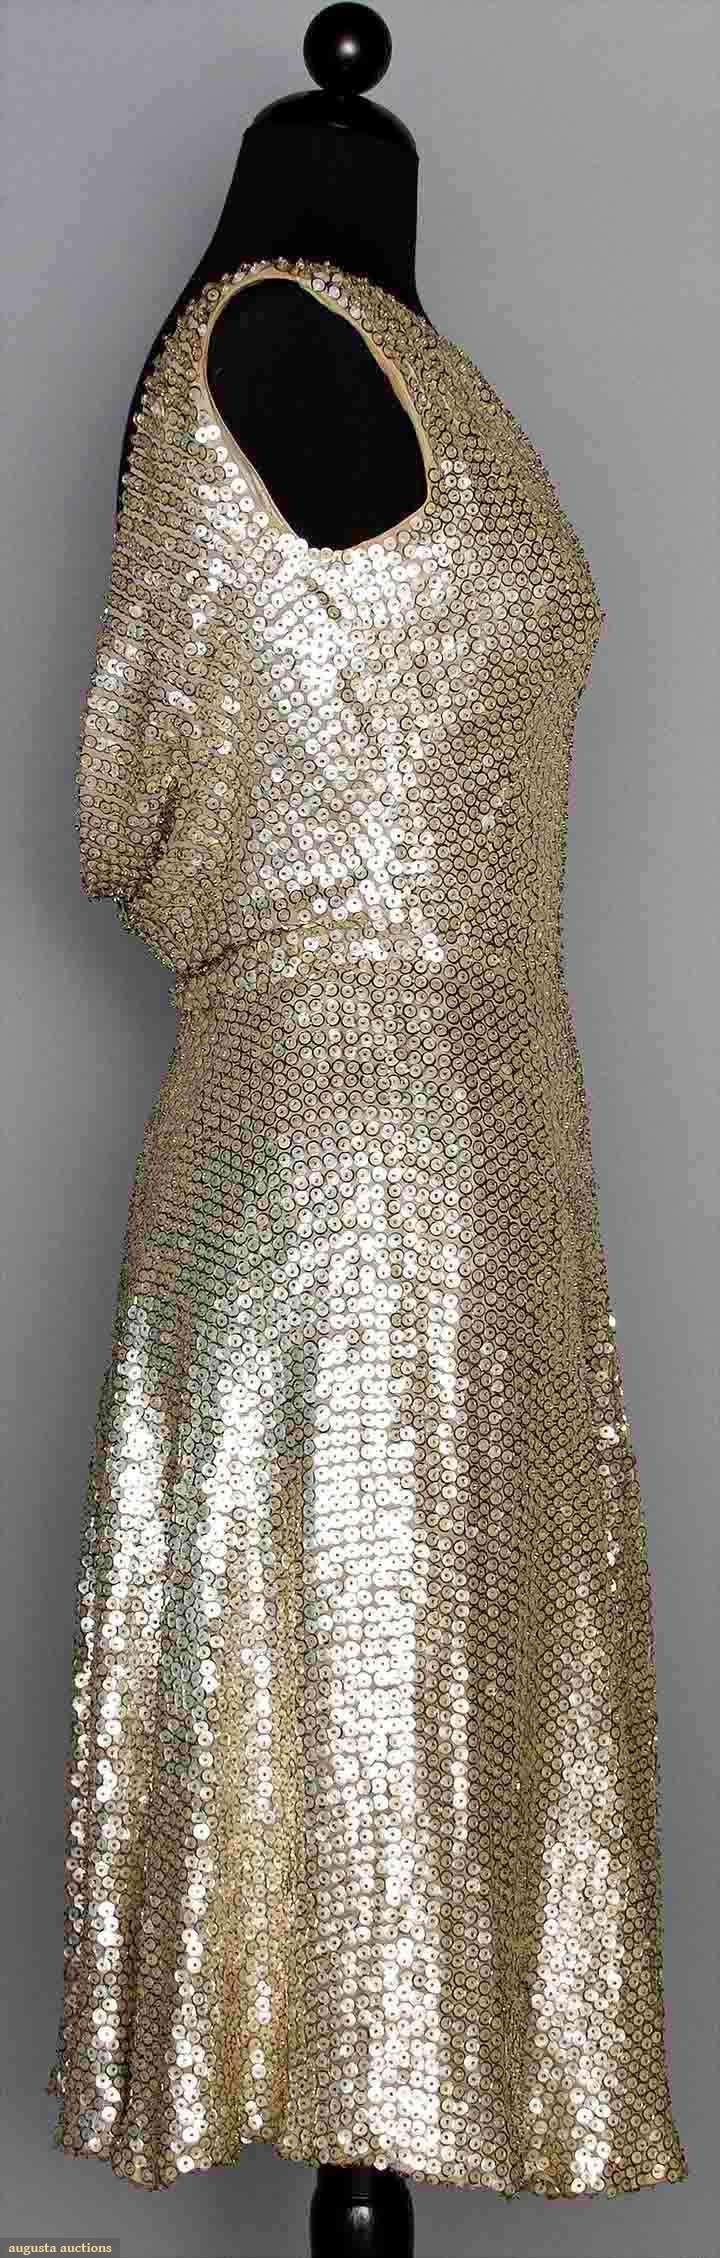 best sequins images on pinterest